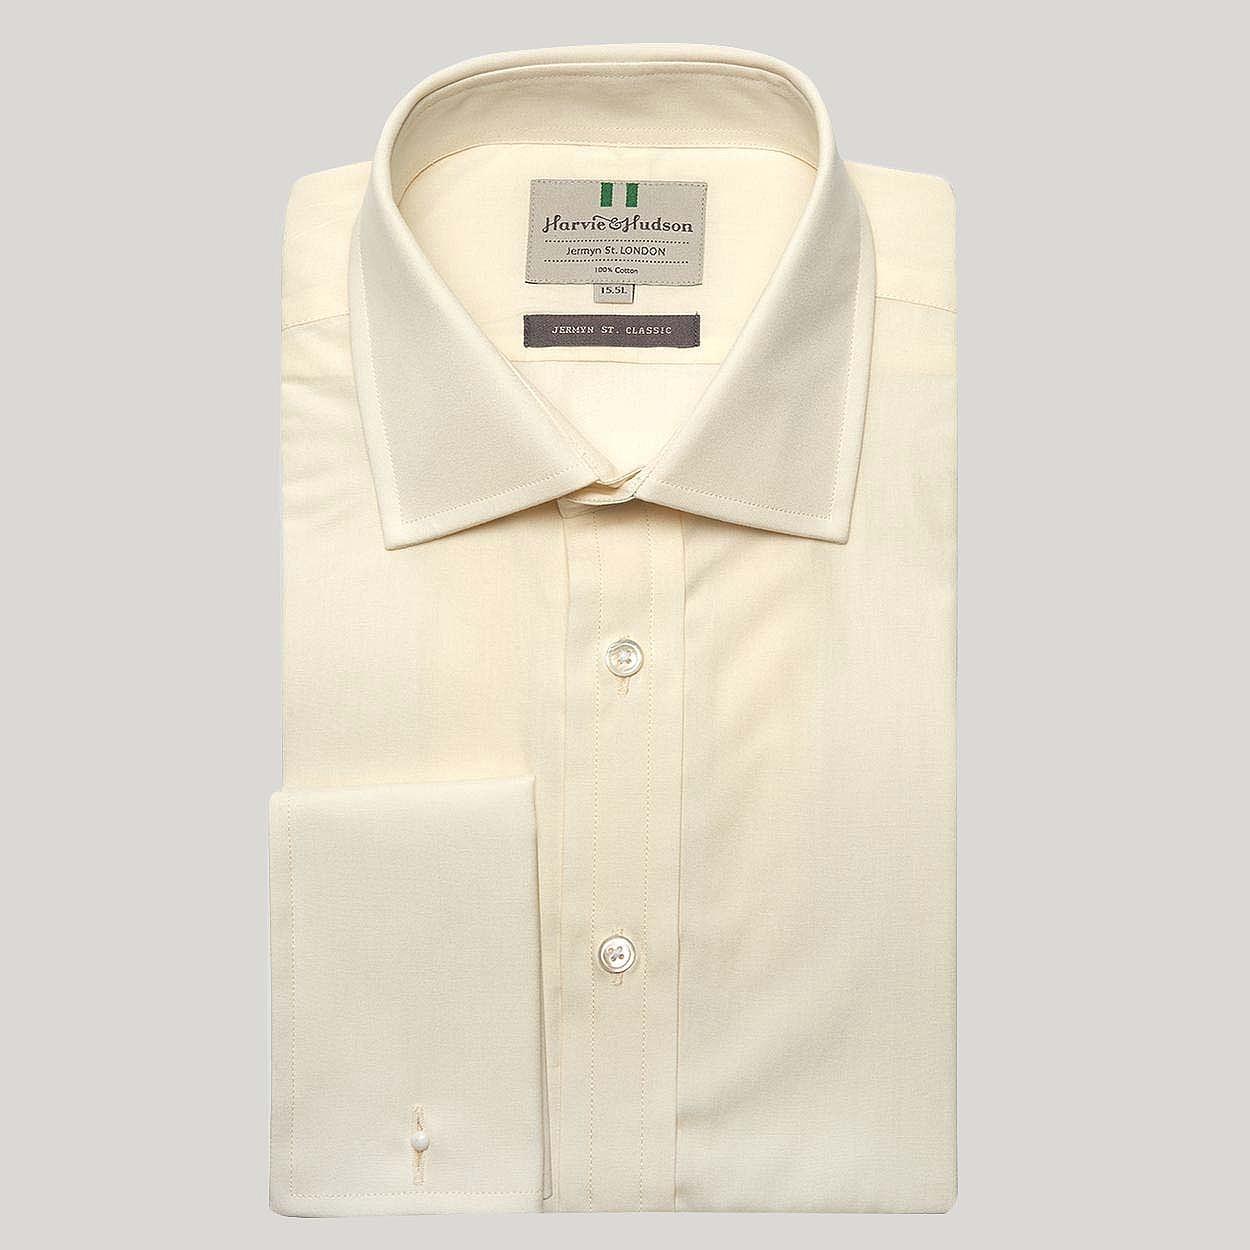 7510dee719d2 Cream Plain Poplin Double cuff Shirt